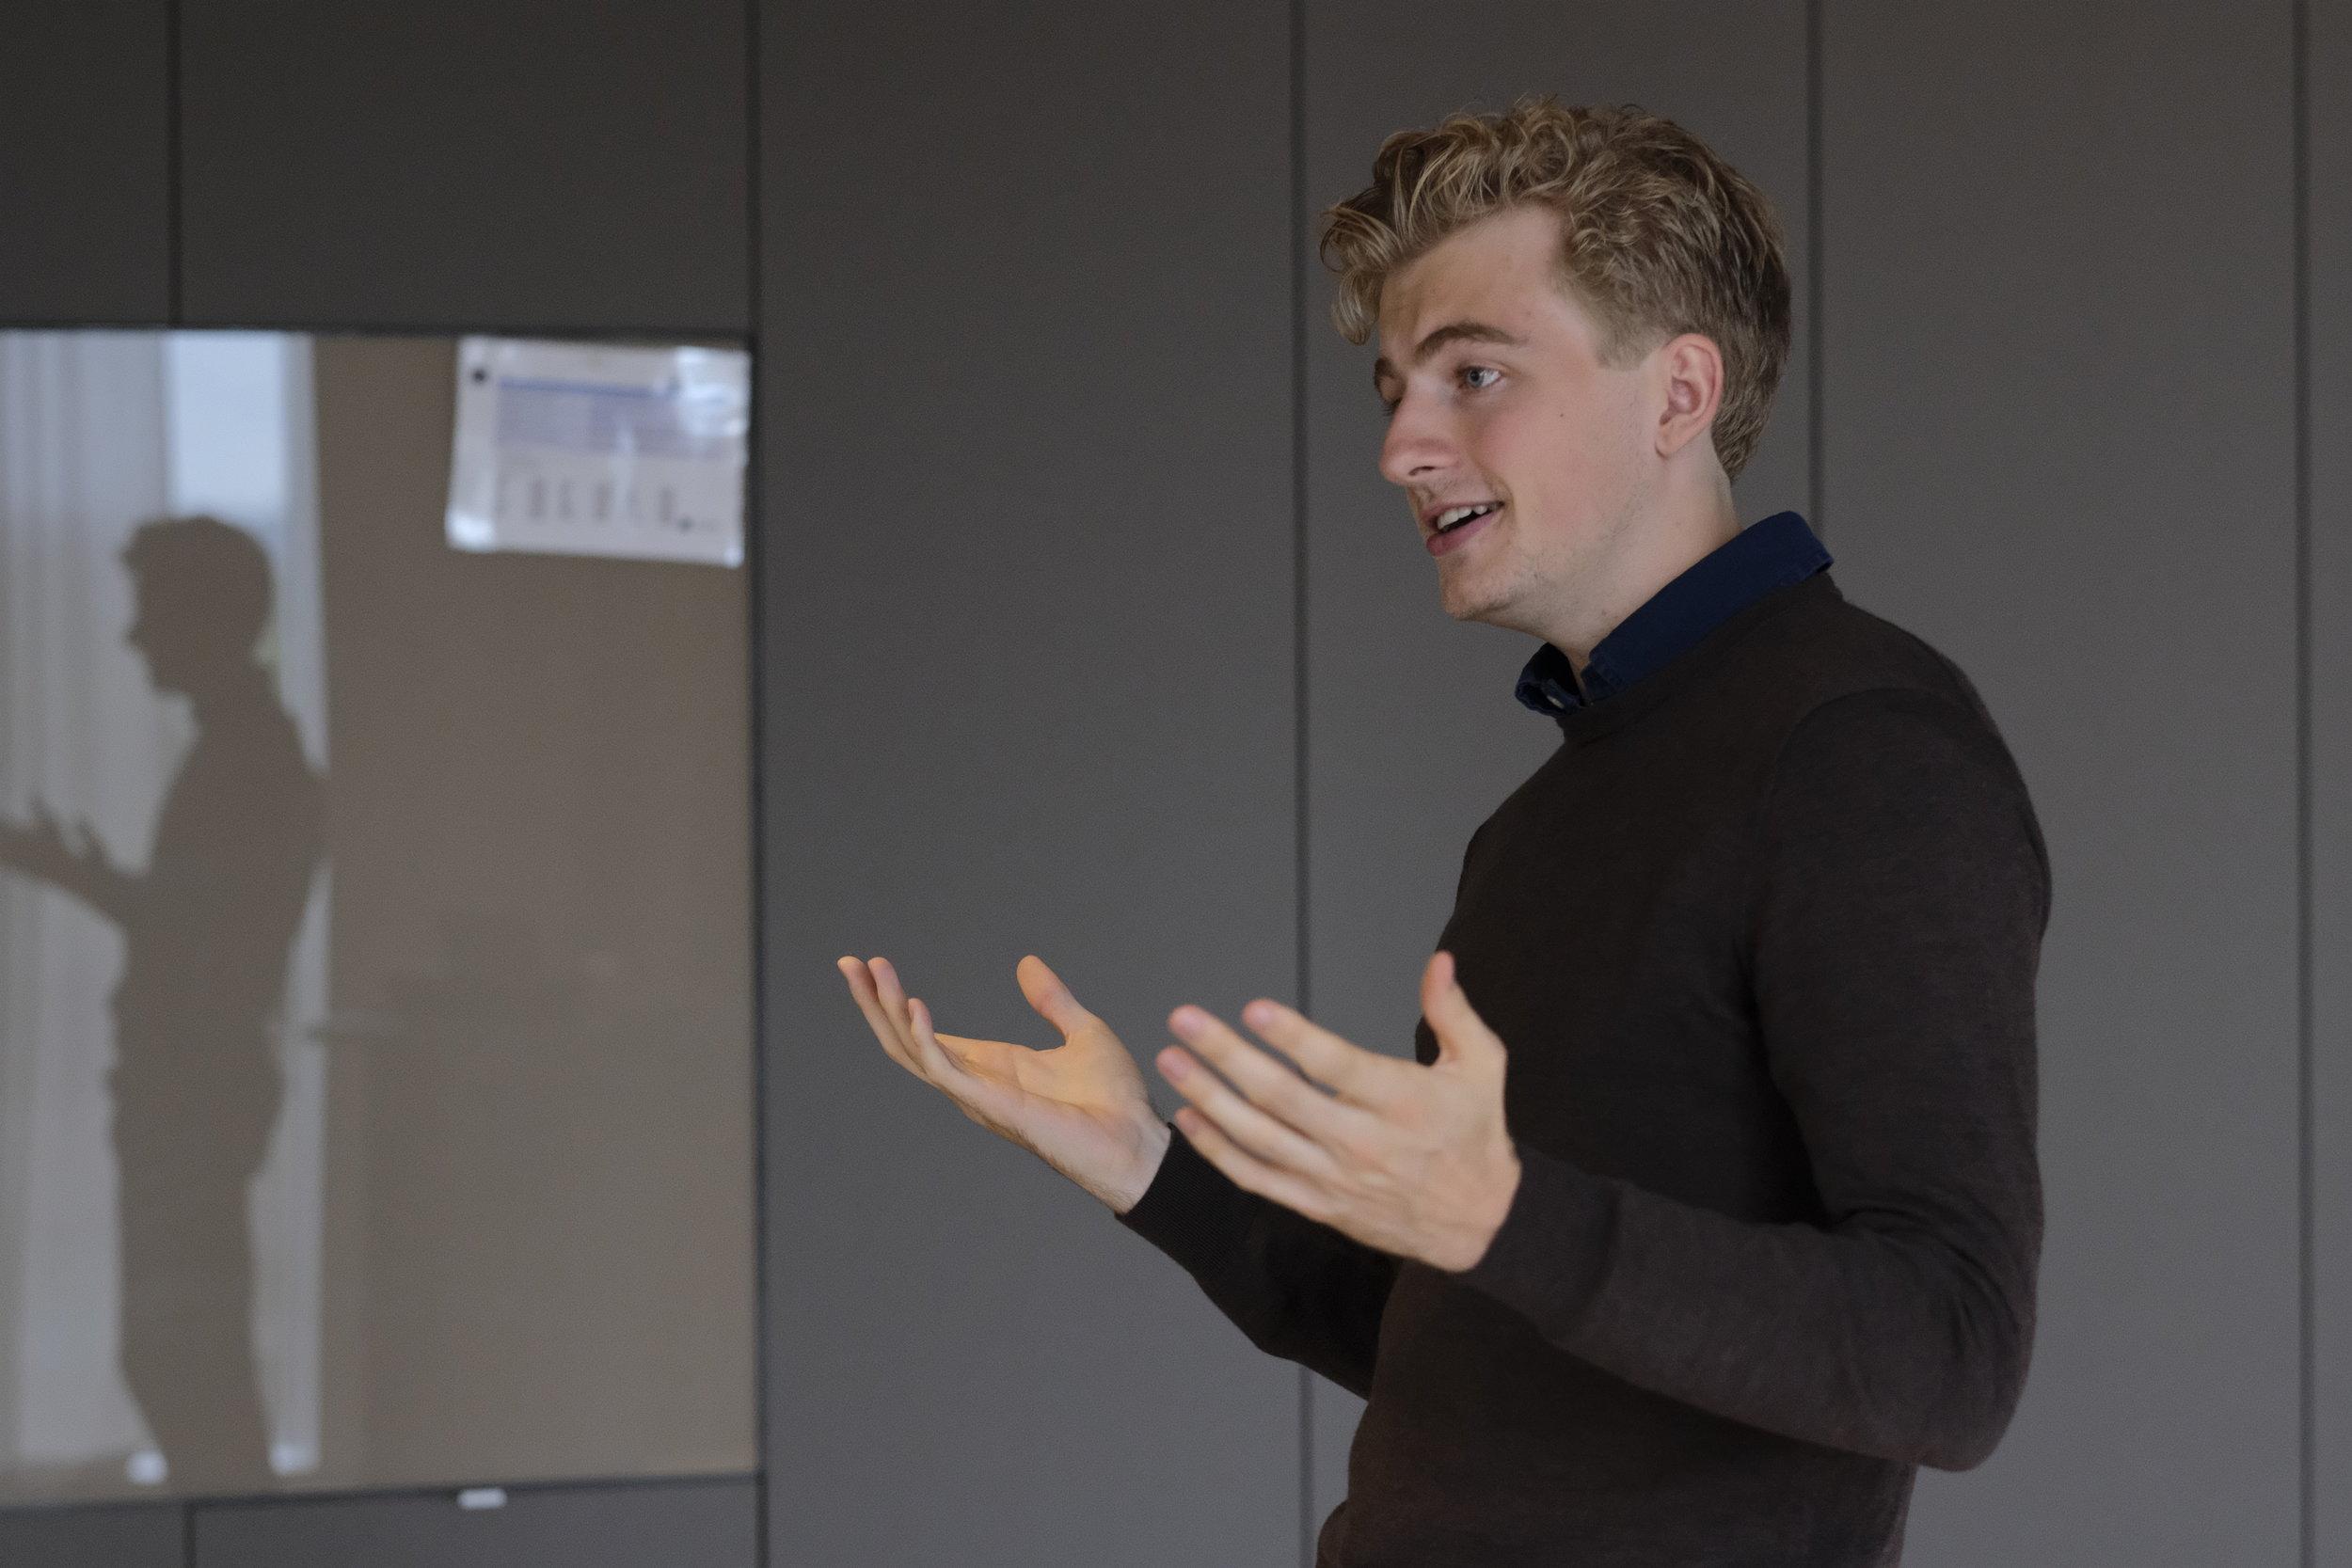 Frederik Mellbye - MS Computational and Mathematical Engineering